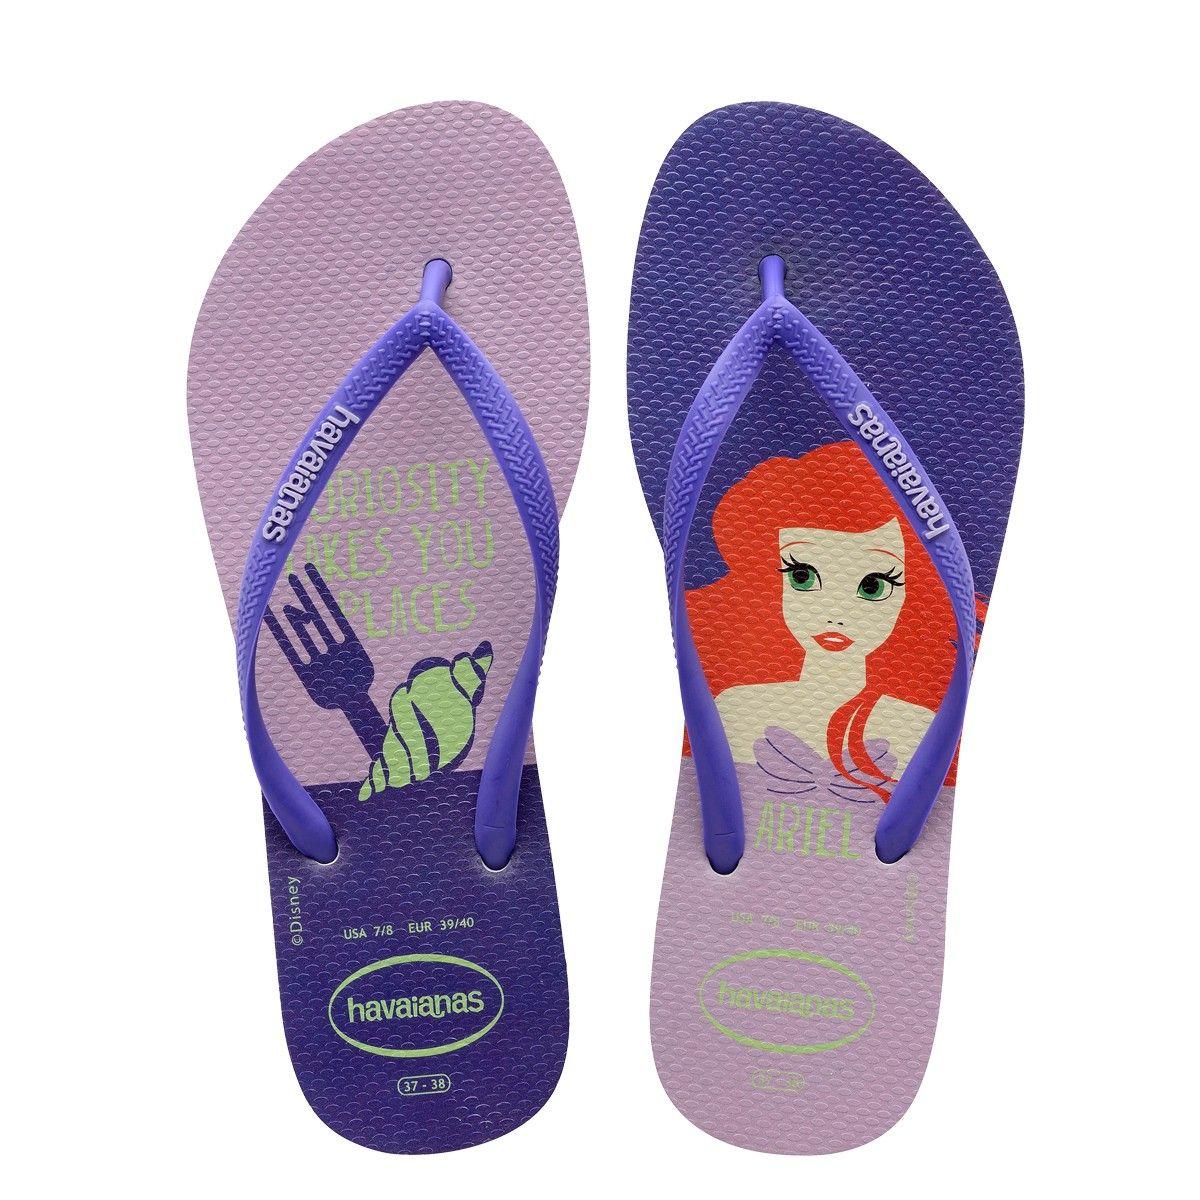 090c3cc0c Havaianas Slim Princesas Disney's Ariel Flip Flops Purple - 6 in ...